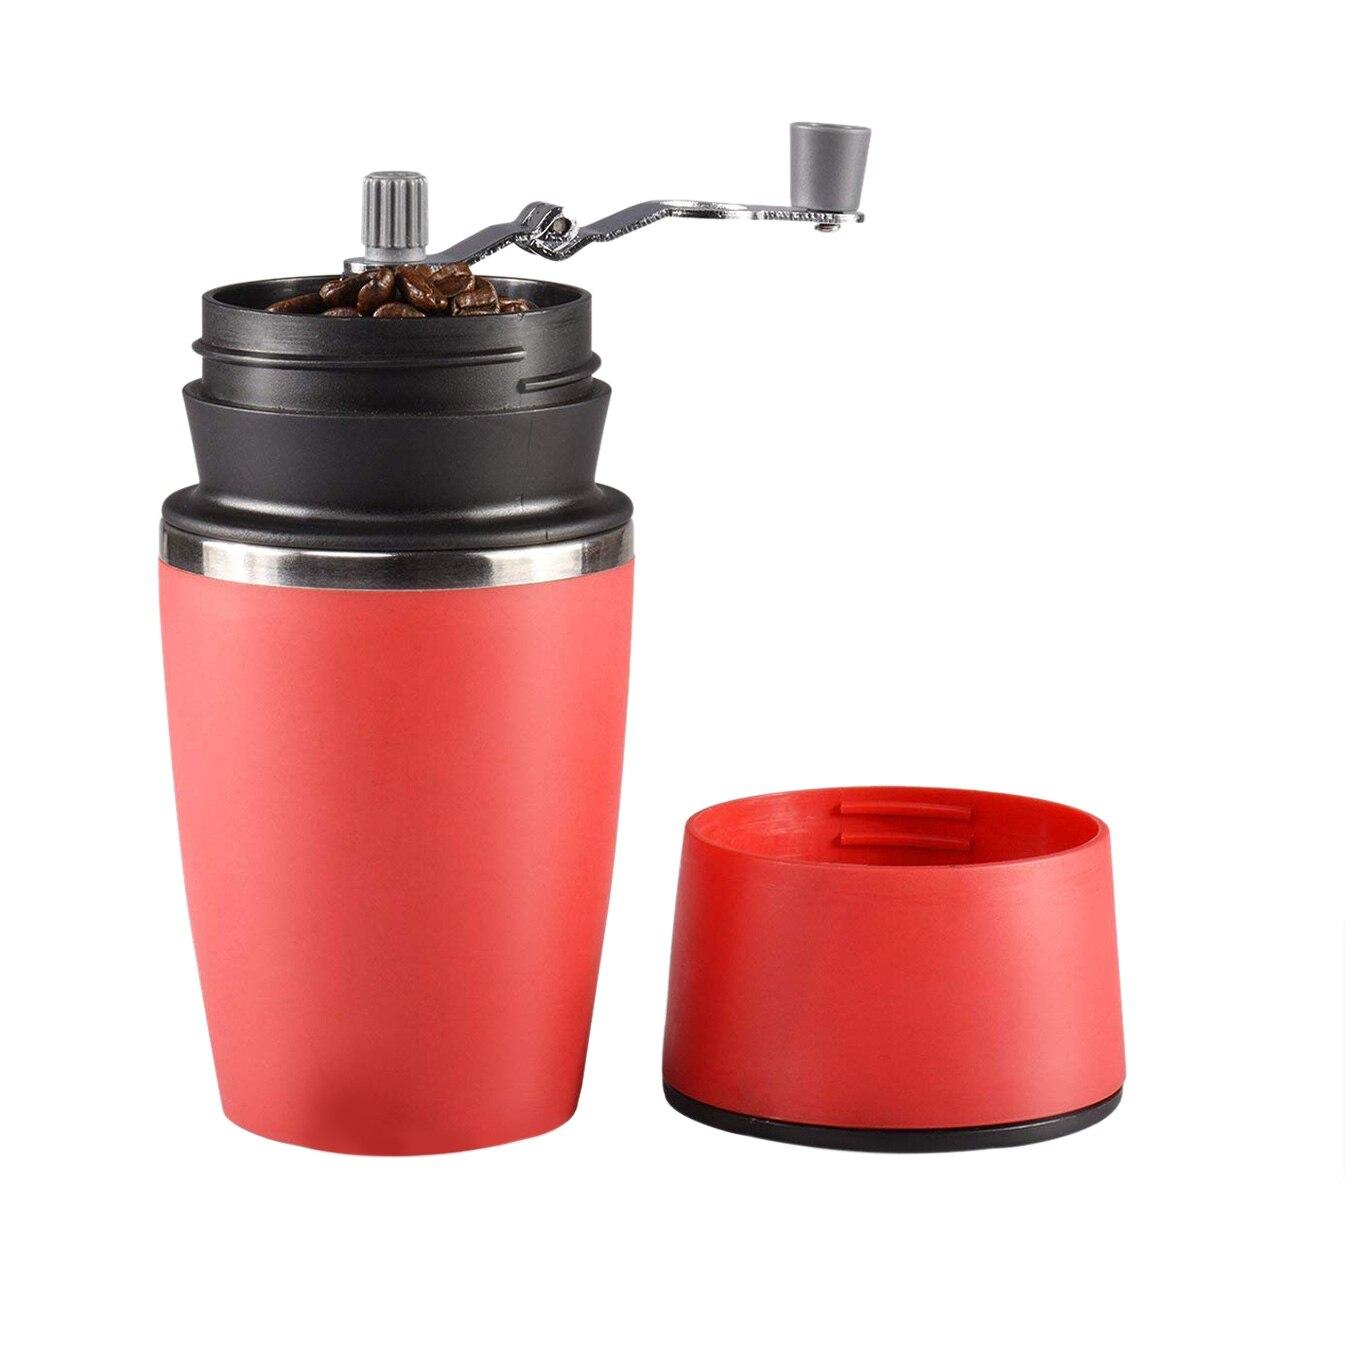 Portable Manual Coffee Grinder Adjustable Single Cup